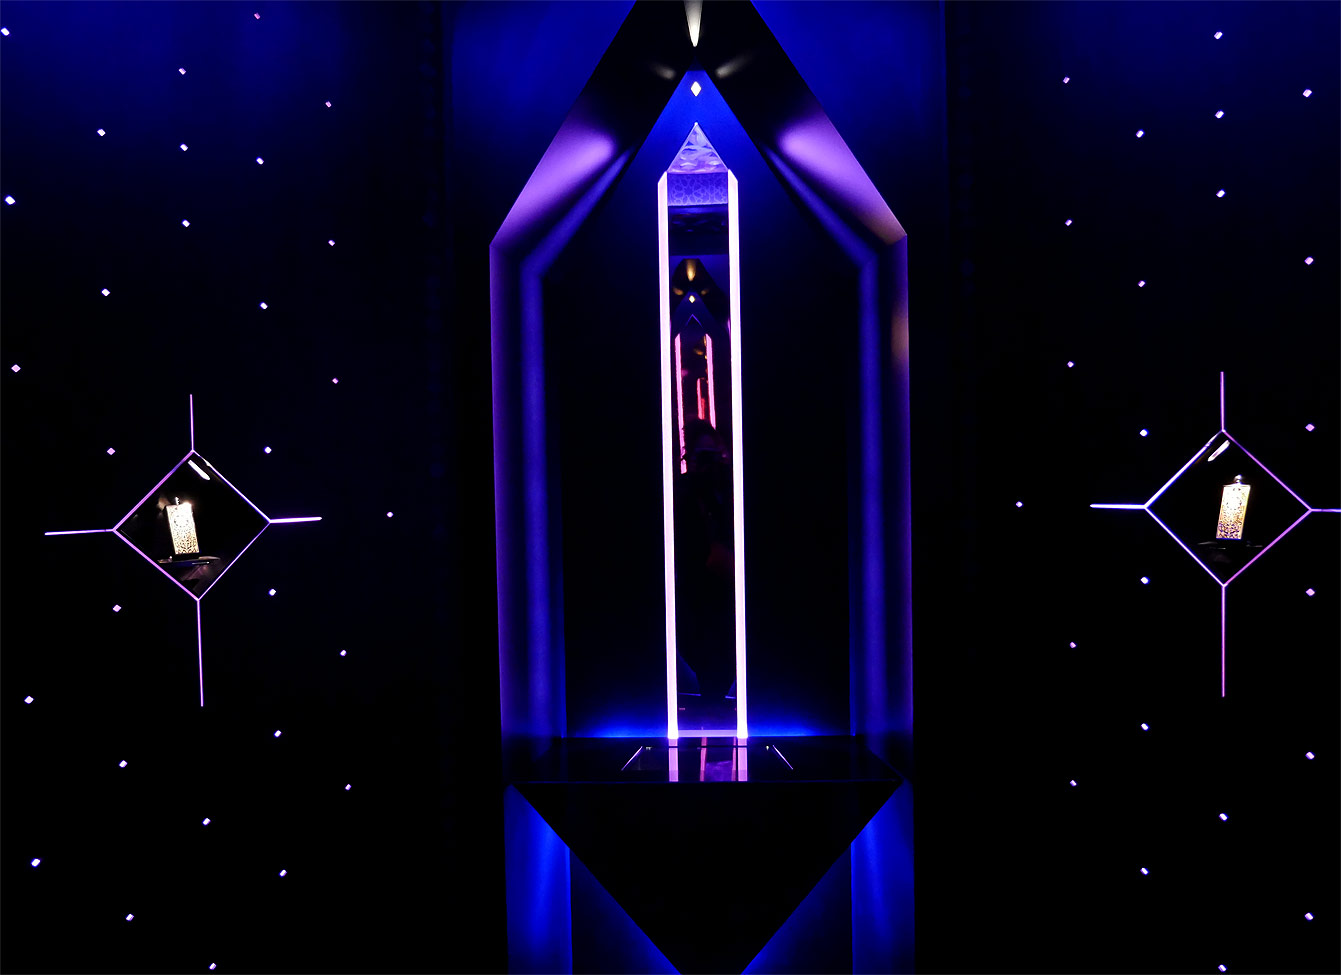 serge-lutens-espace-palais-royal-04